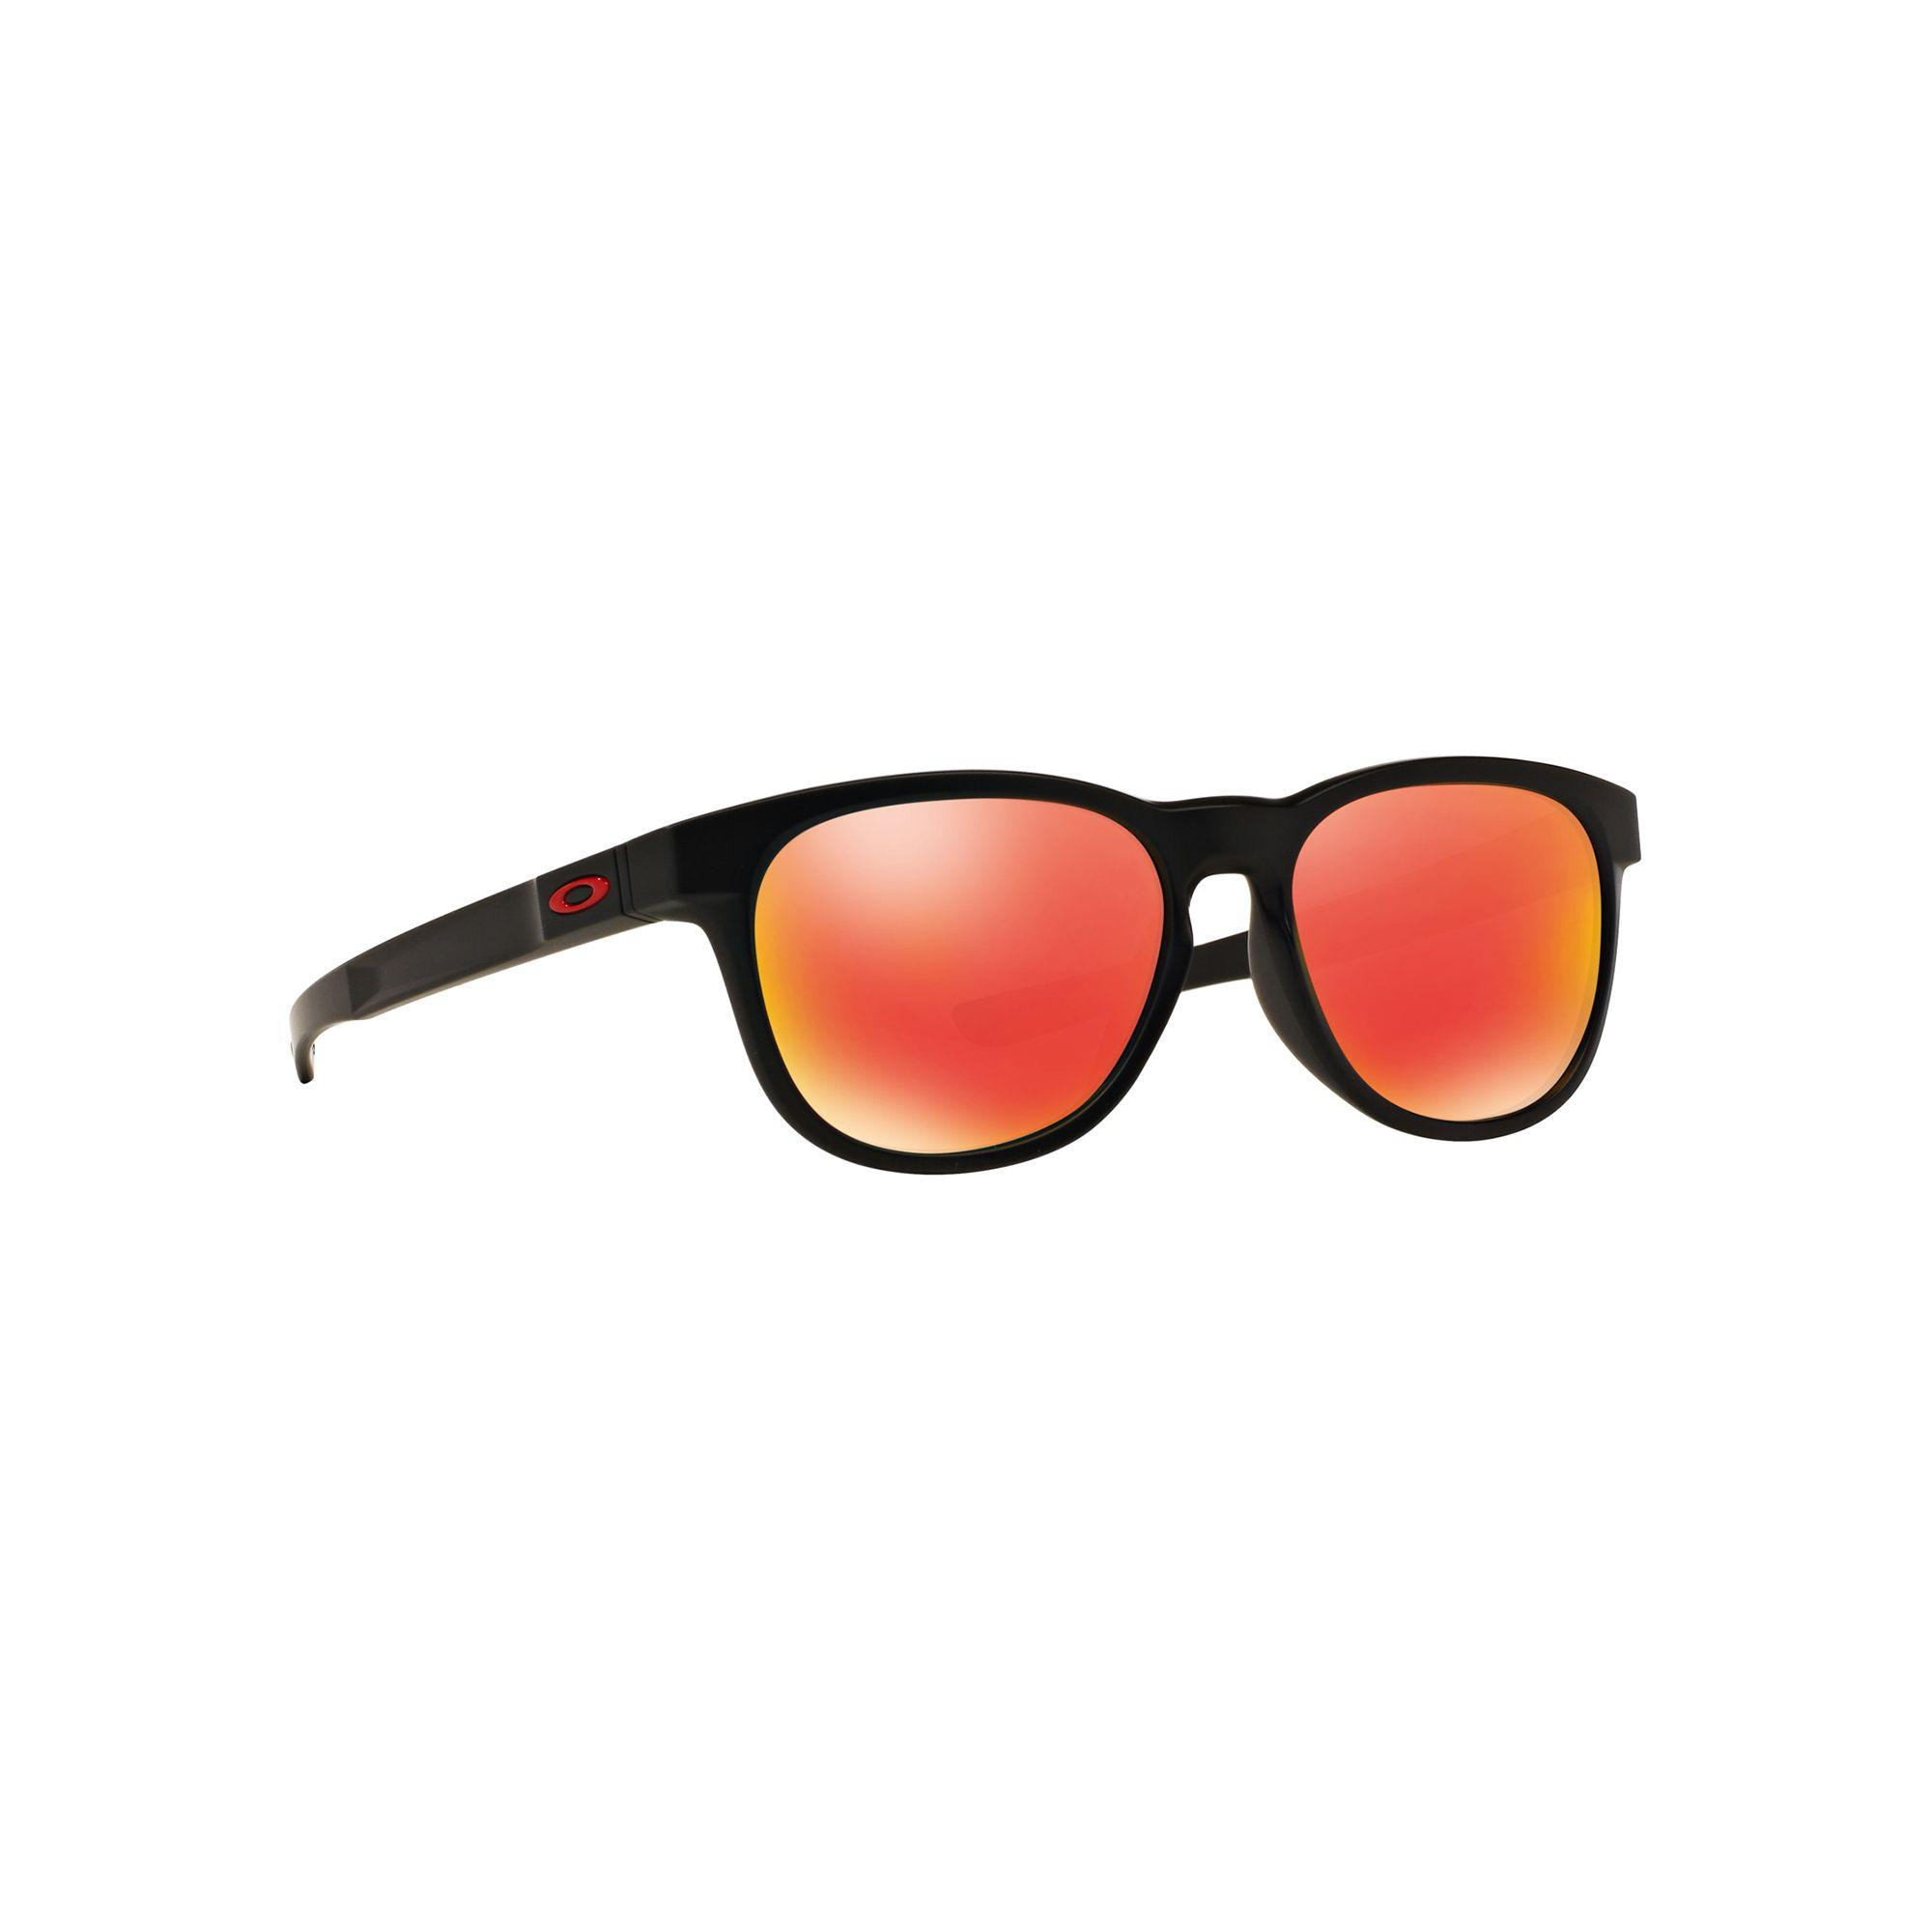 6bd86c28a7 Rectangle Matte Sunglasses In Black Oakley  stringer  Oo9315 Lyst qIwf5gg.